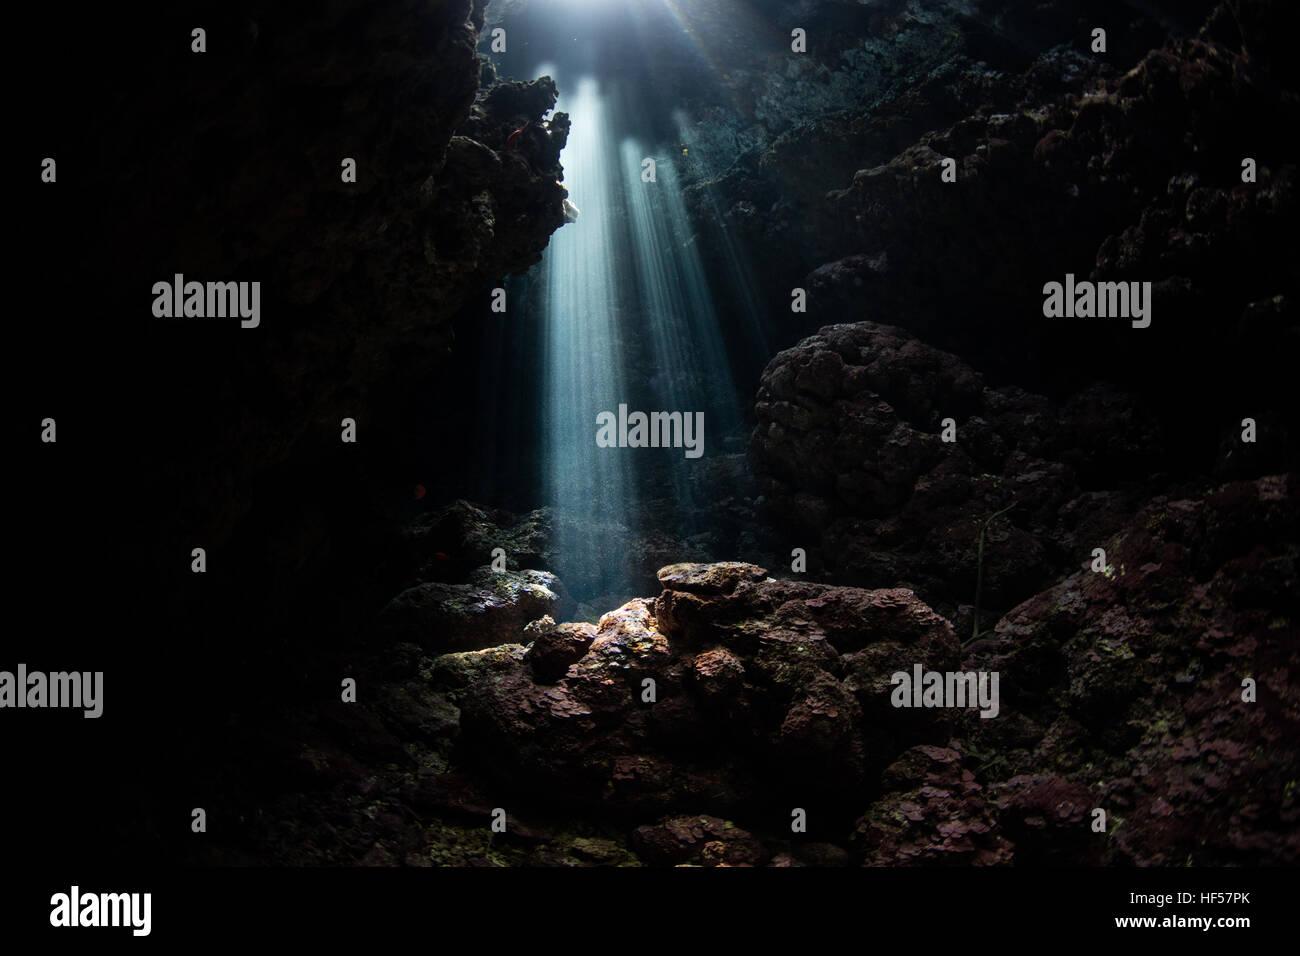 Beams of bright sunlight descend into a dark, underwater grotto in the Solomon Islands. This region harbors high - Stock Image